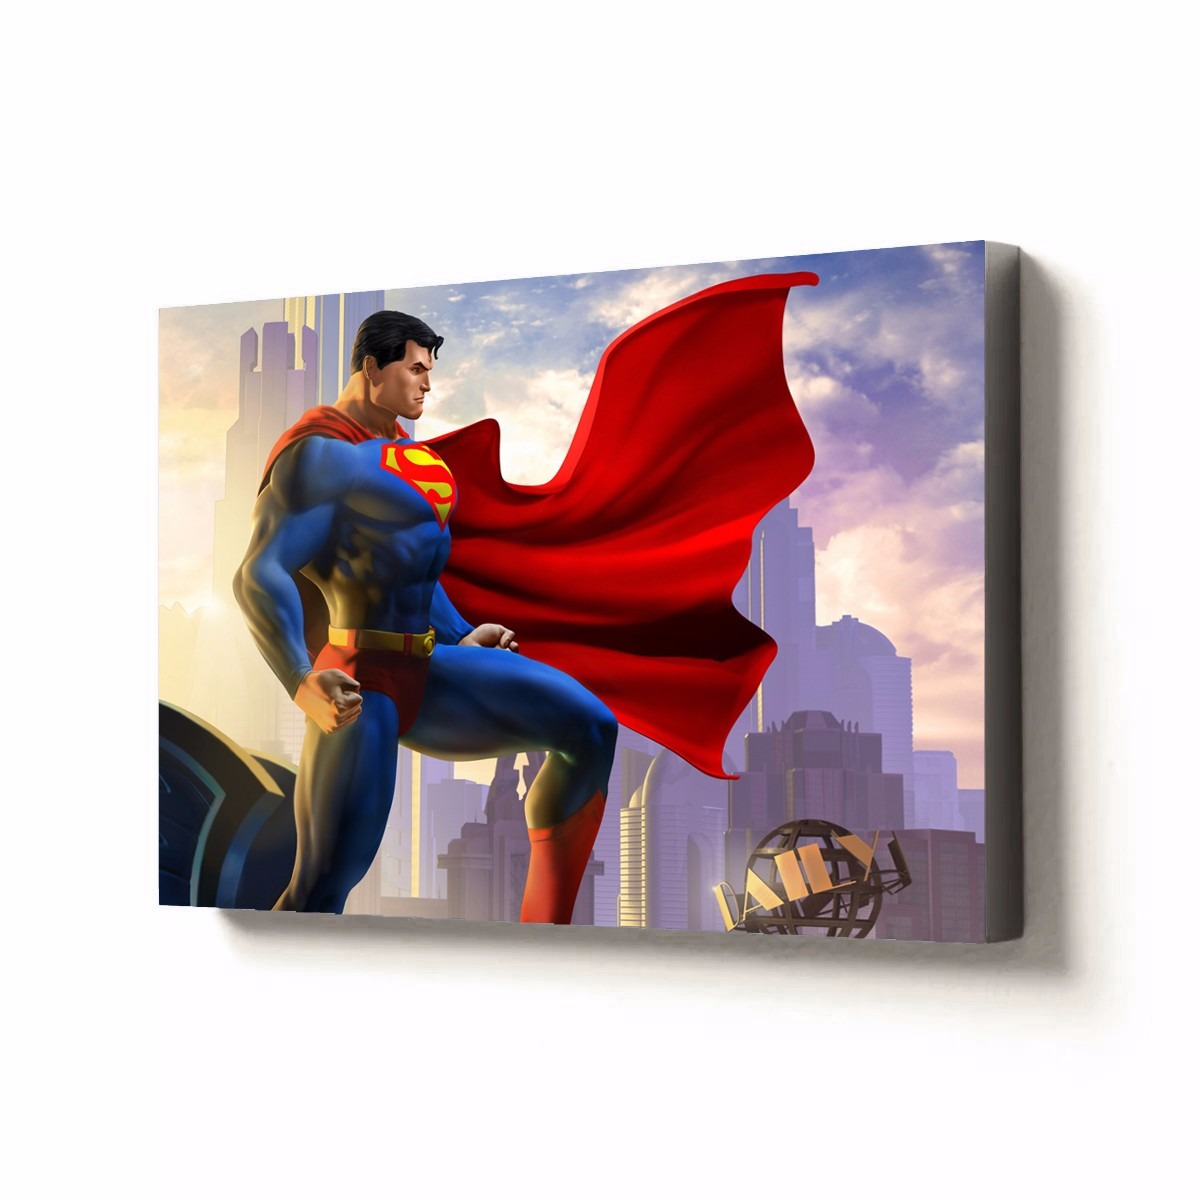 Cuadro De Superman Poster Afiche Sobre Marco De 30 X 20 Cm ...